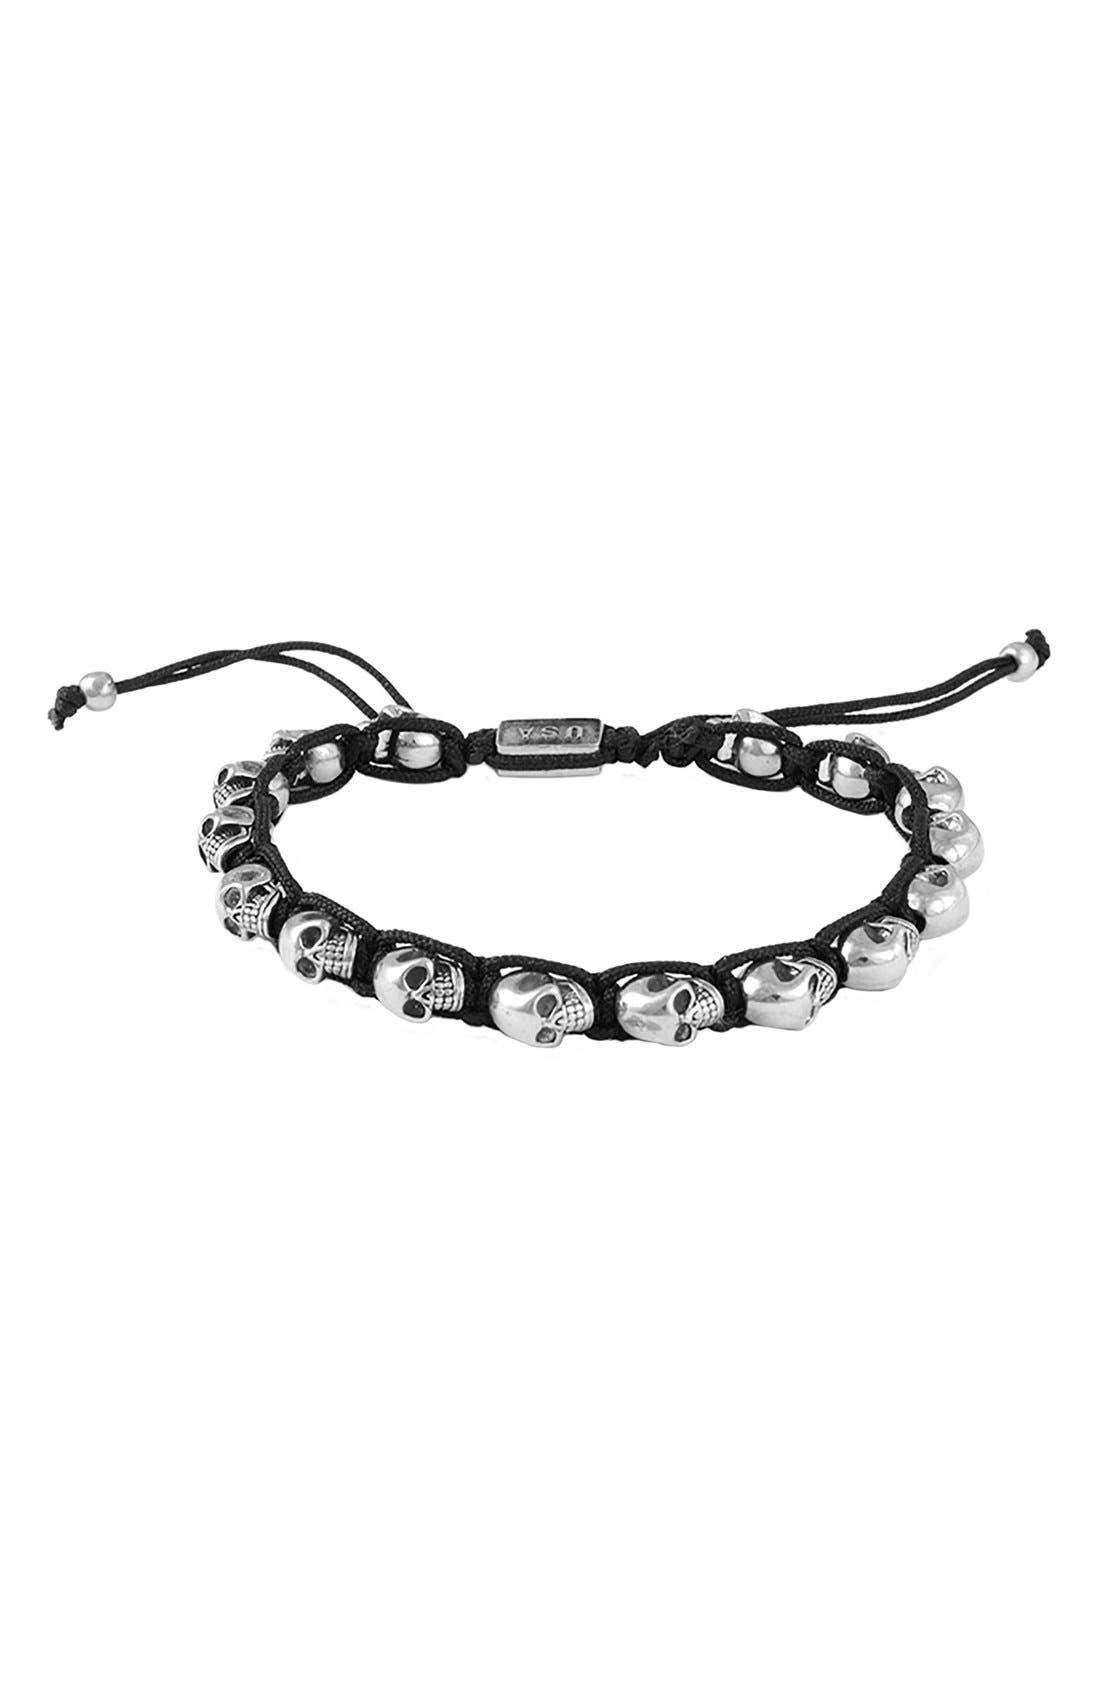 Skull Bracelet,                             Main thumbnail 1, color,                             SILVER/ BLACK